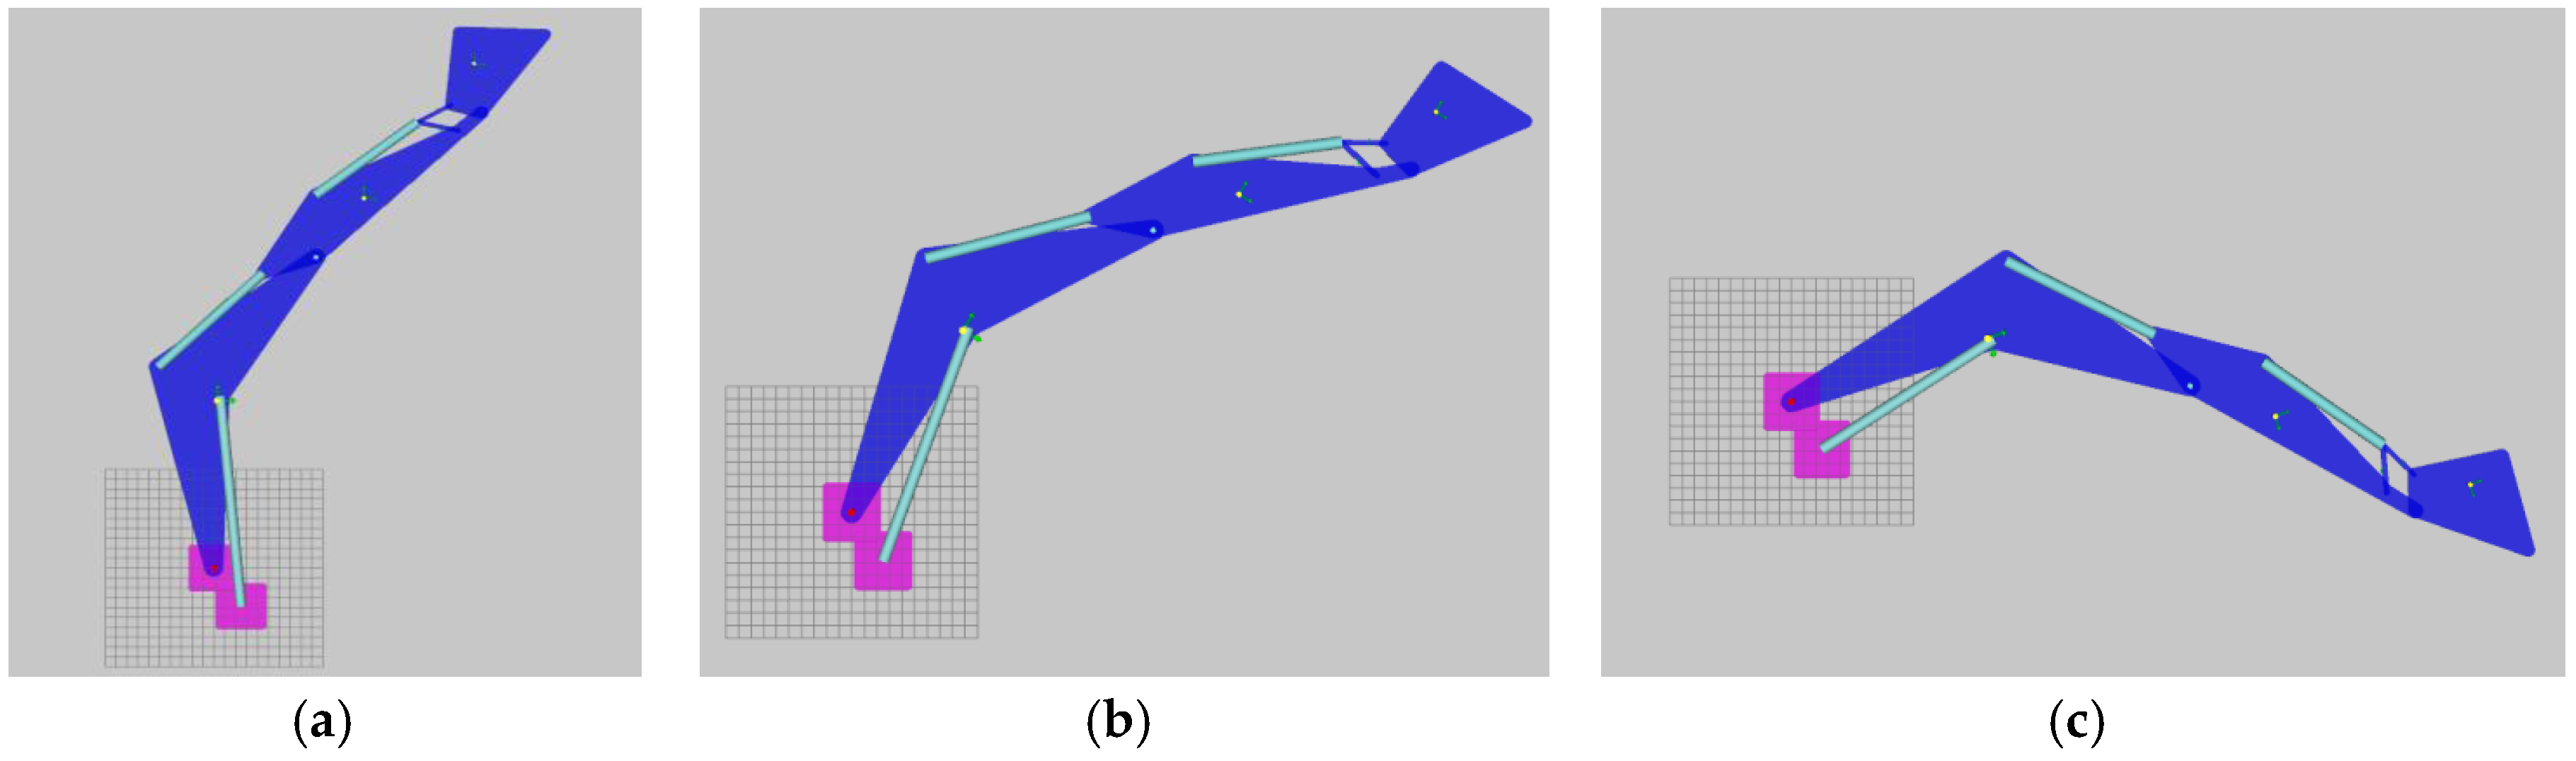 Energies   Free Full-Text   Hydraulic Hybrid Excavator—Mathematical ...